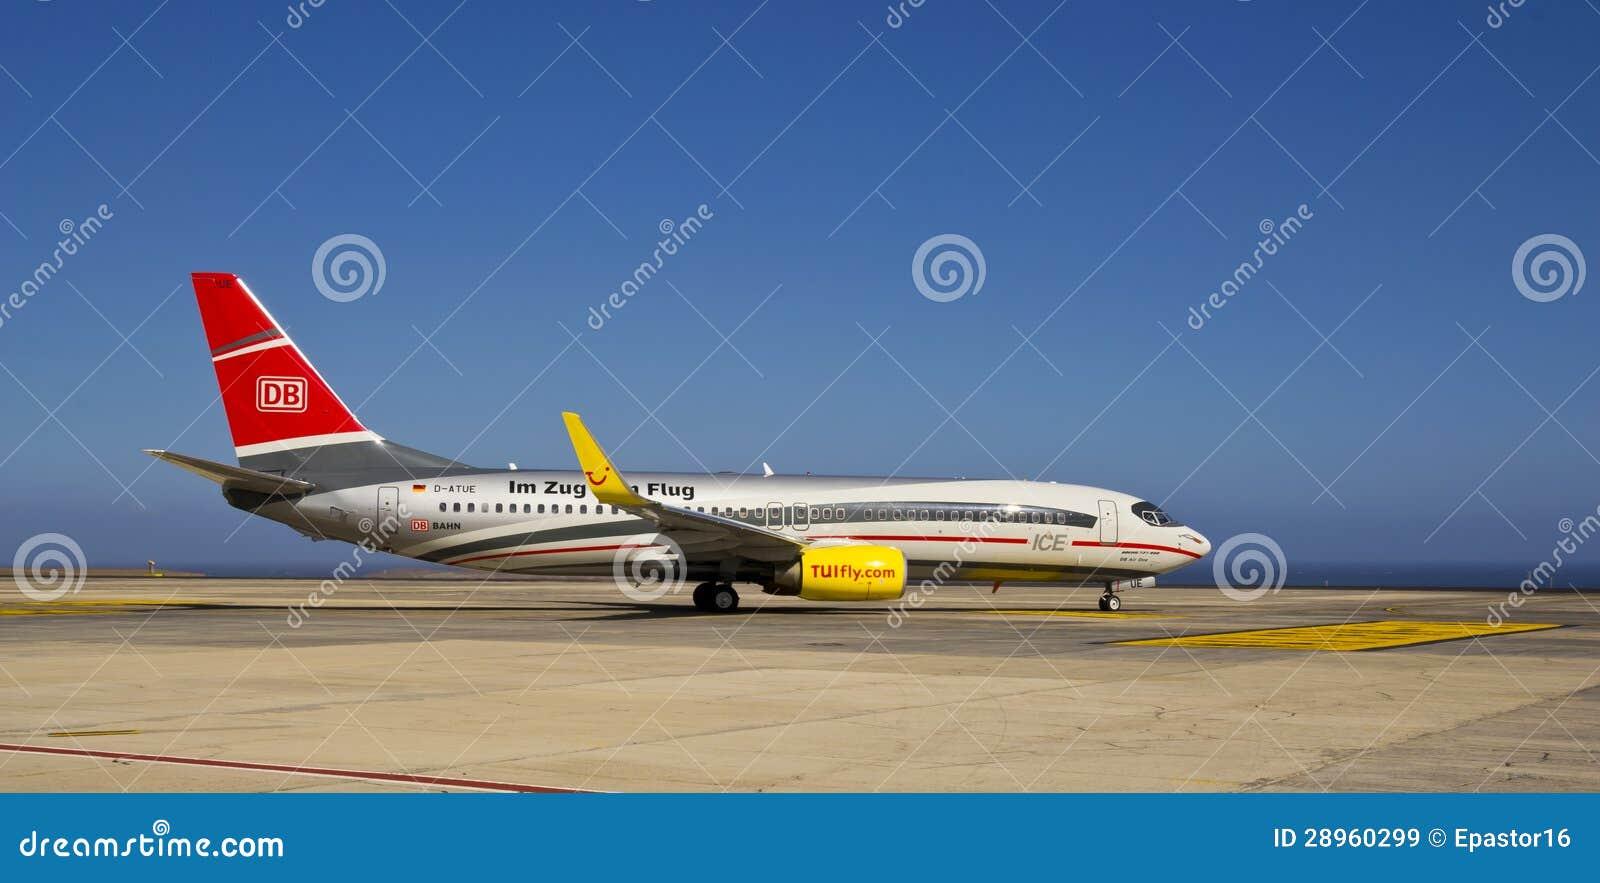 TUI komarnica Zug Zum Flug, Boeing 737-800